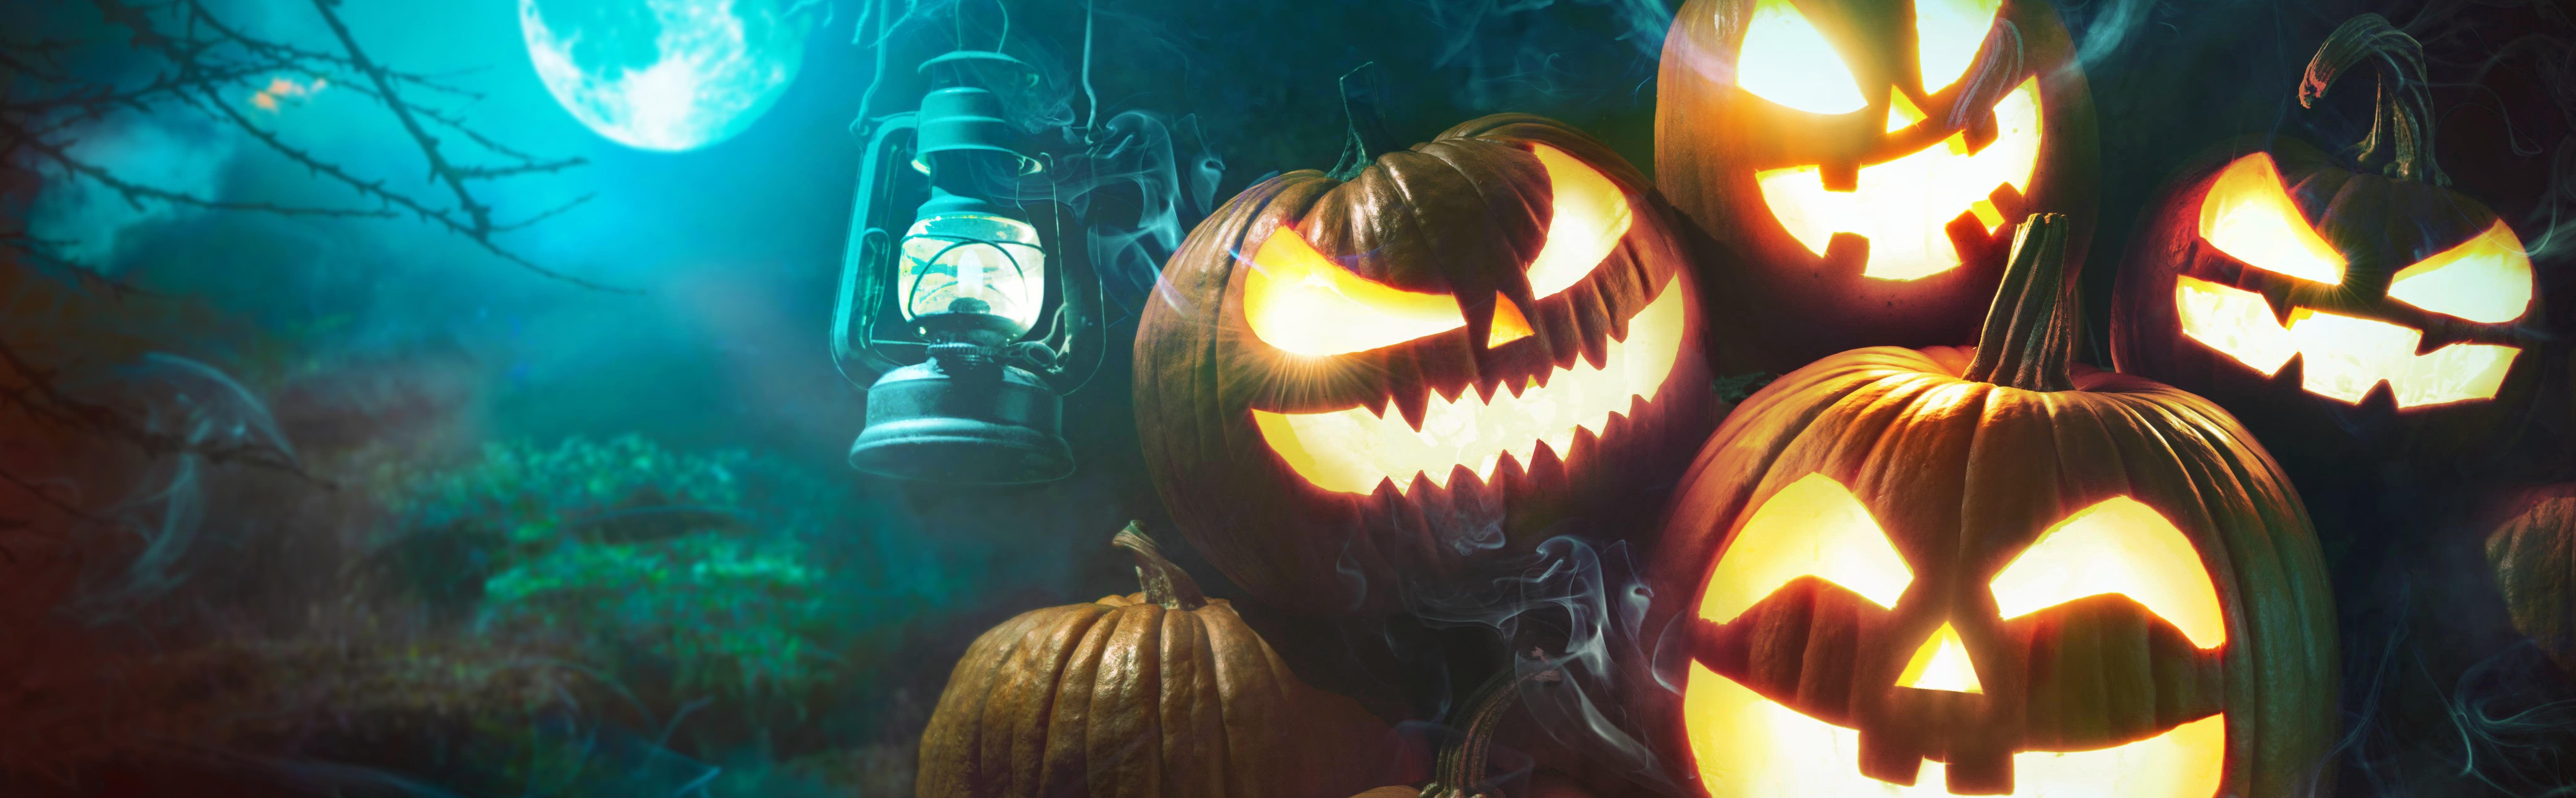 HalloweenINS